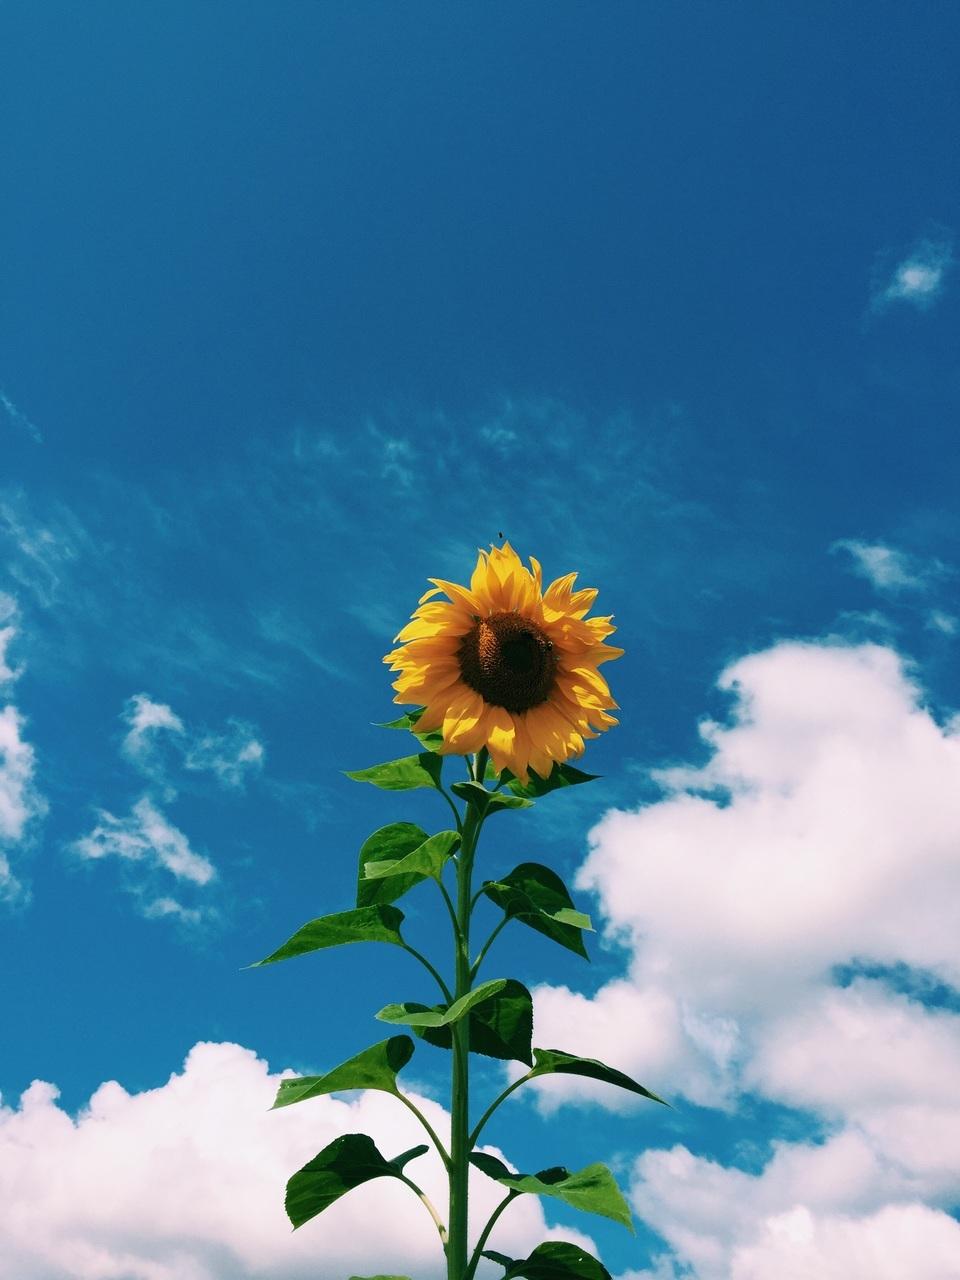 48 Clouds Sunflower Aesthetic Wallpapers On Wallpapersafari